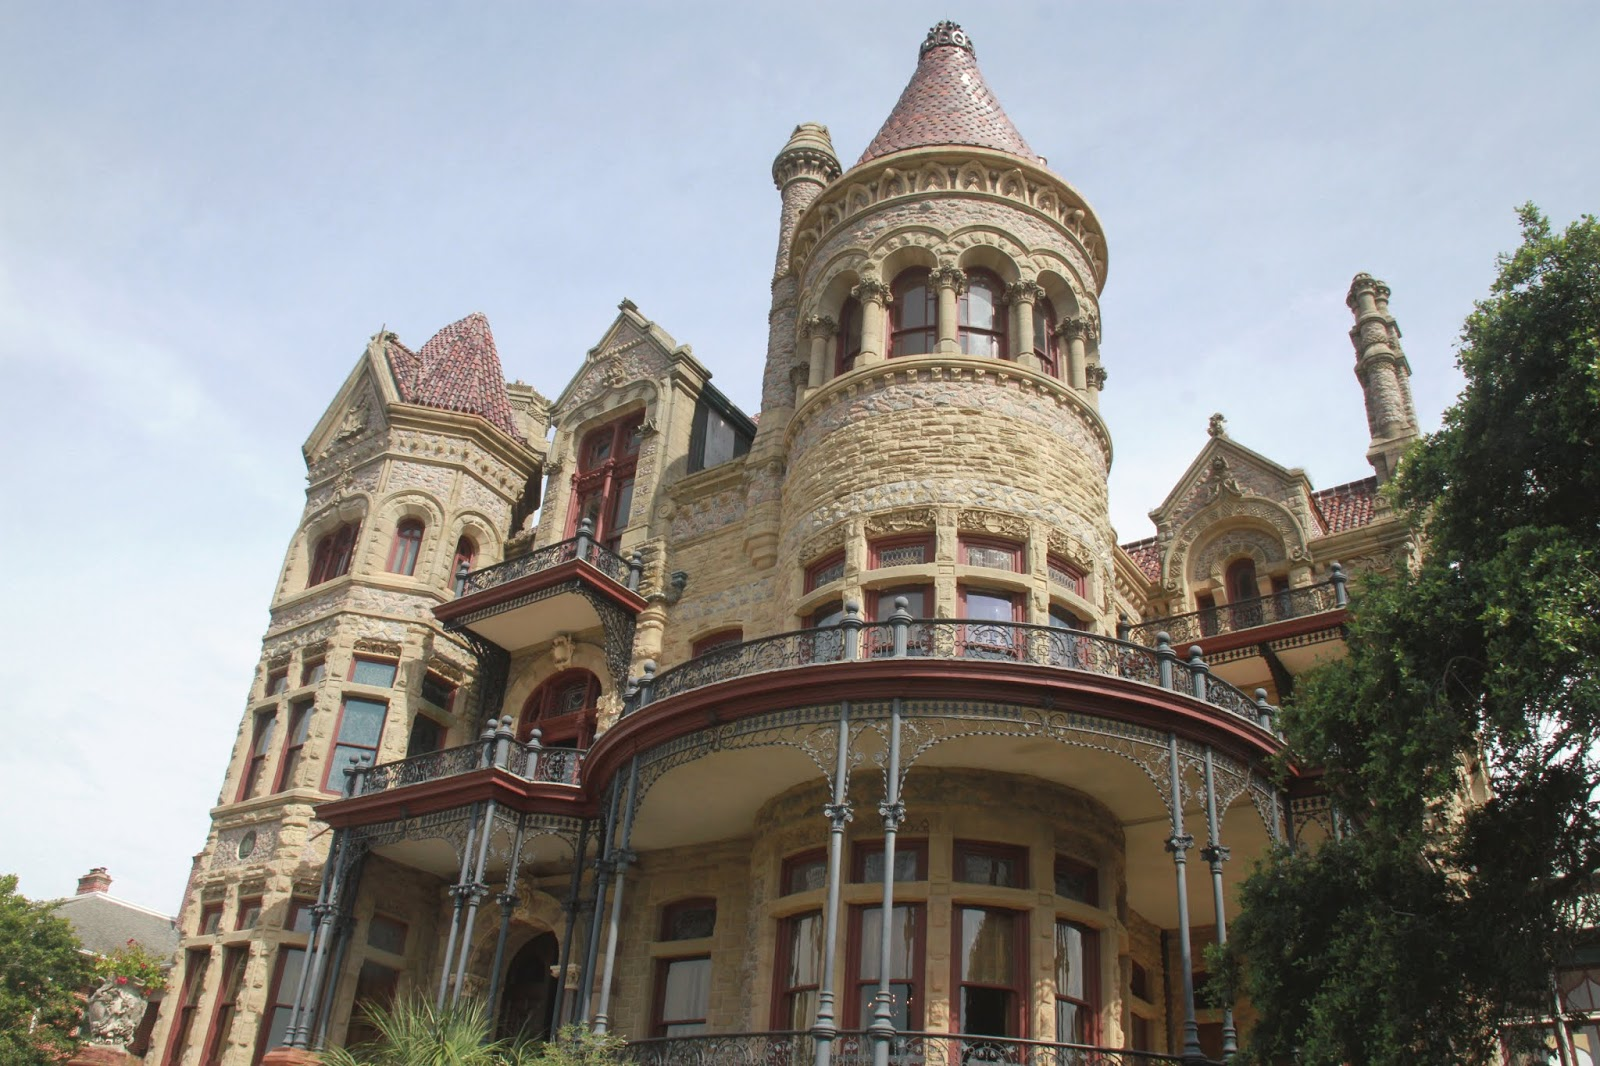 Moody Mansion Galveston, historic Galveston tours, historic Galveston homes, mansions in Galveston, mansion tours Galveston Texas, Bishops Palace Galveston